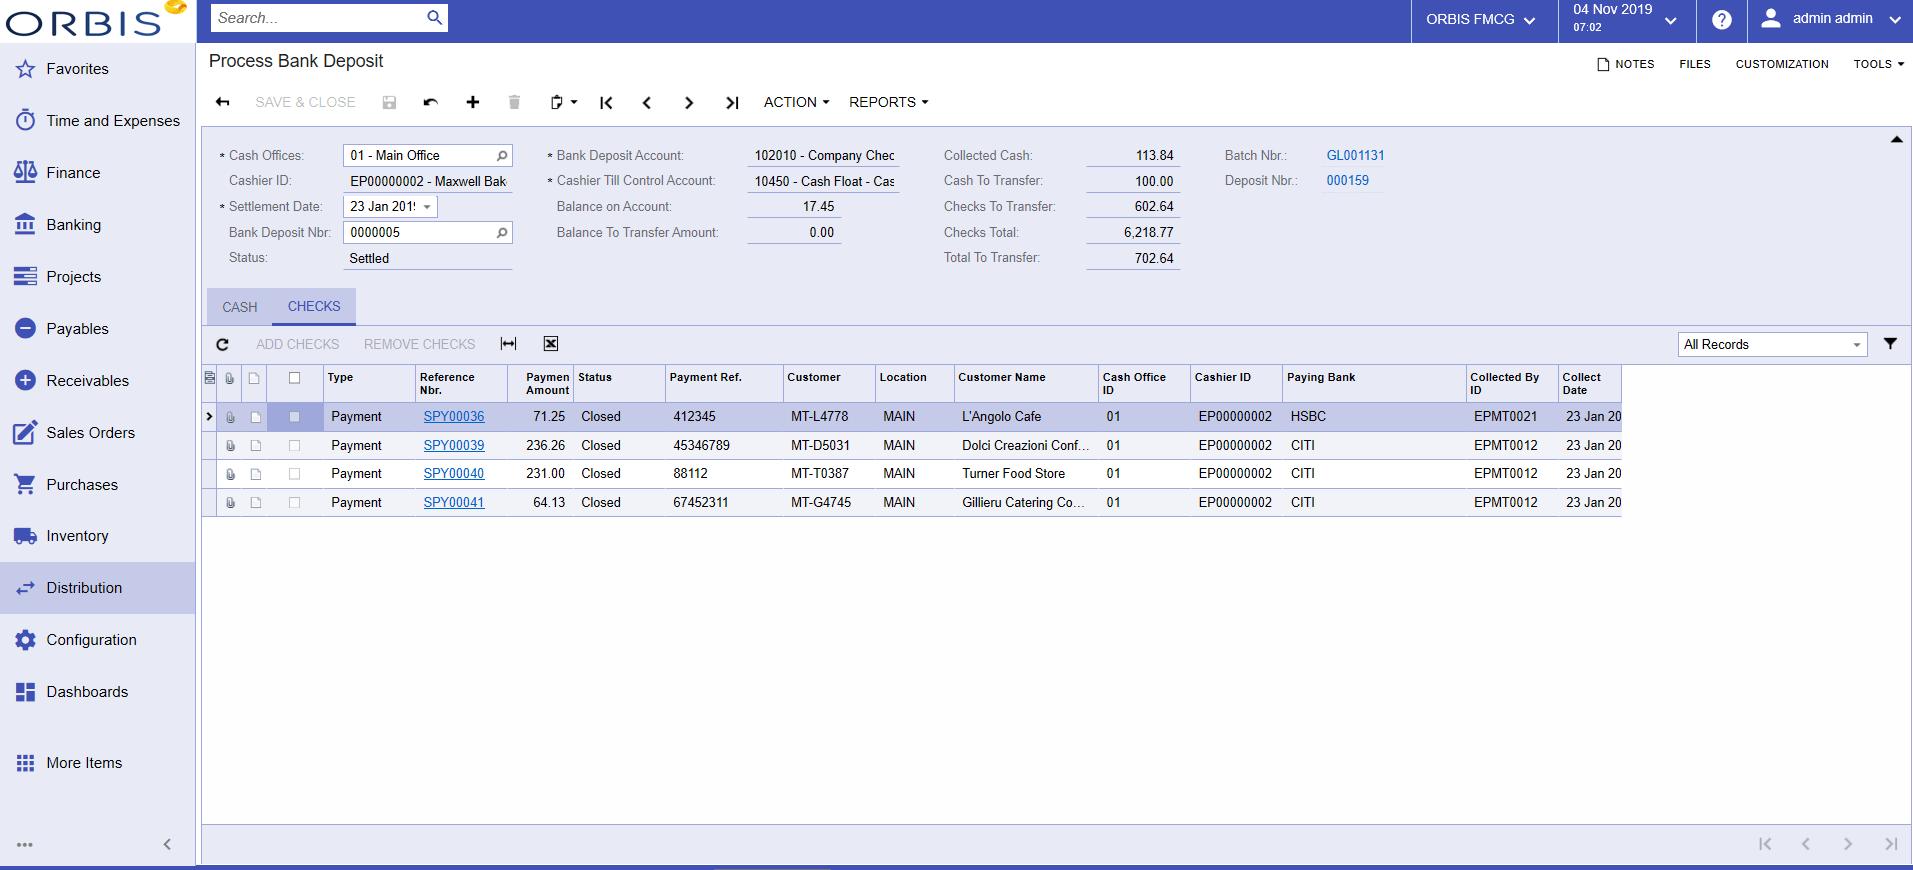 OrbisDSDImage6 - Process Bank Deposit